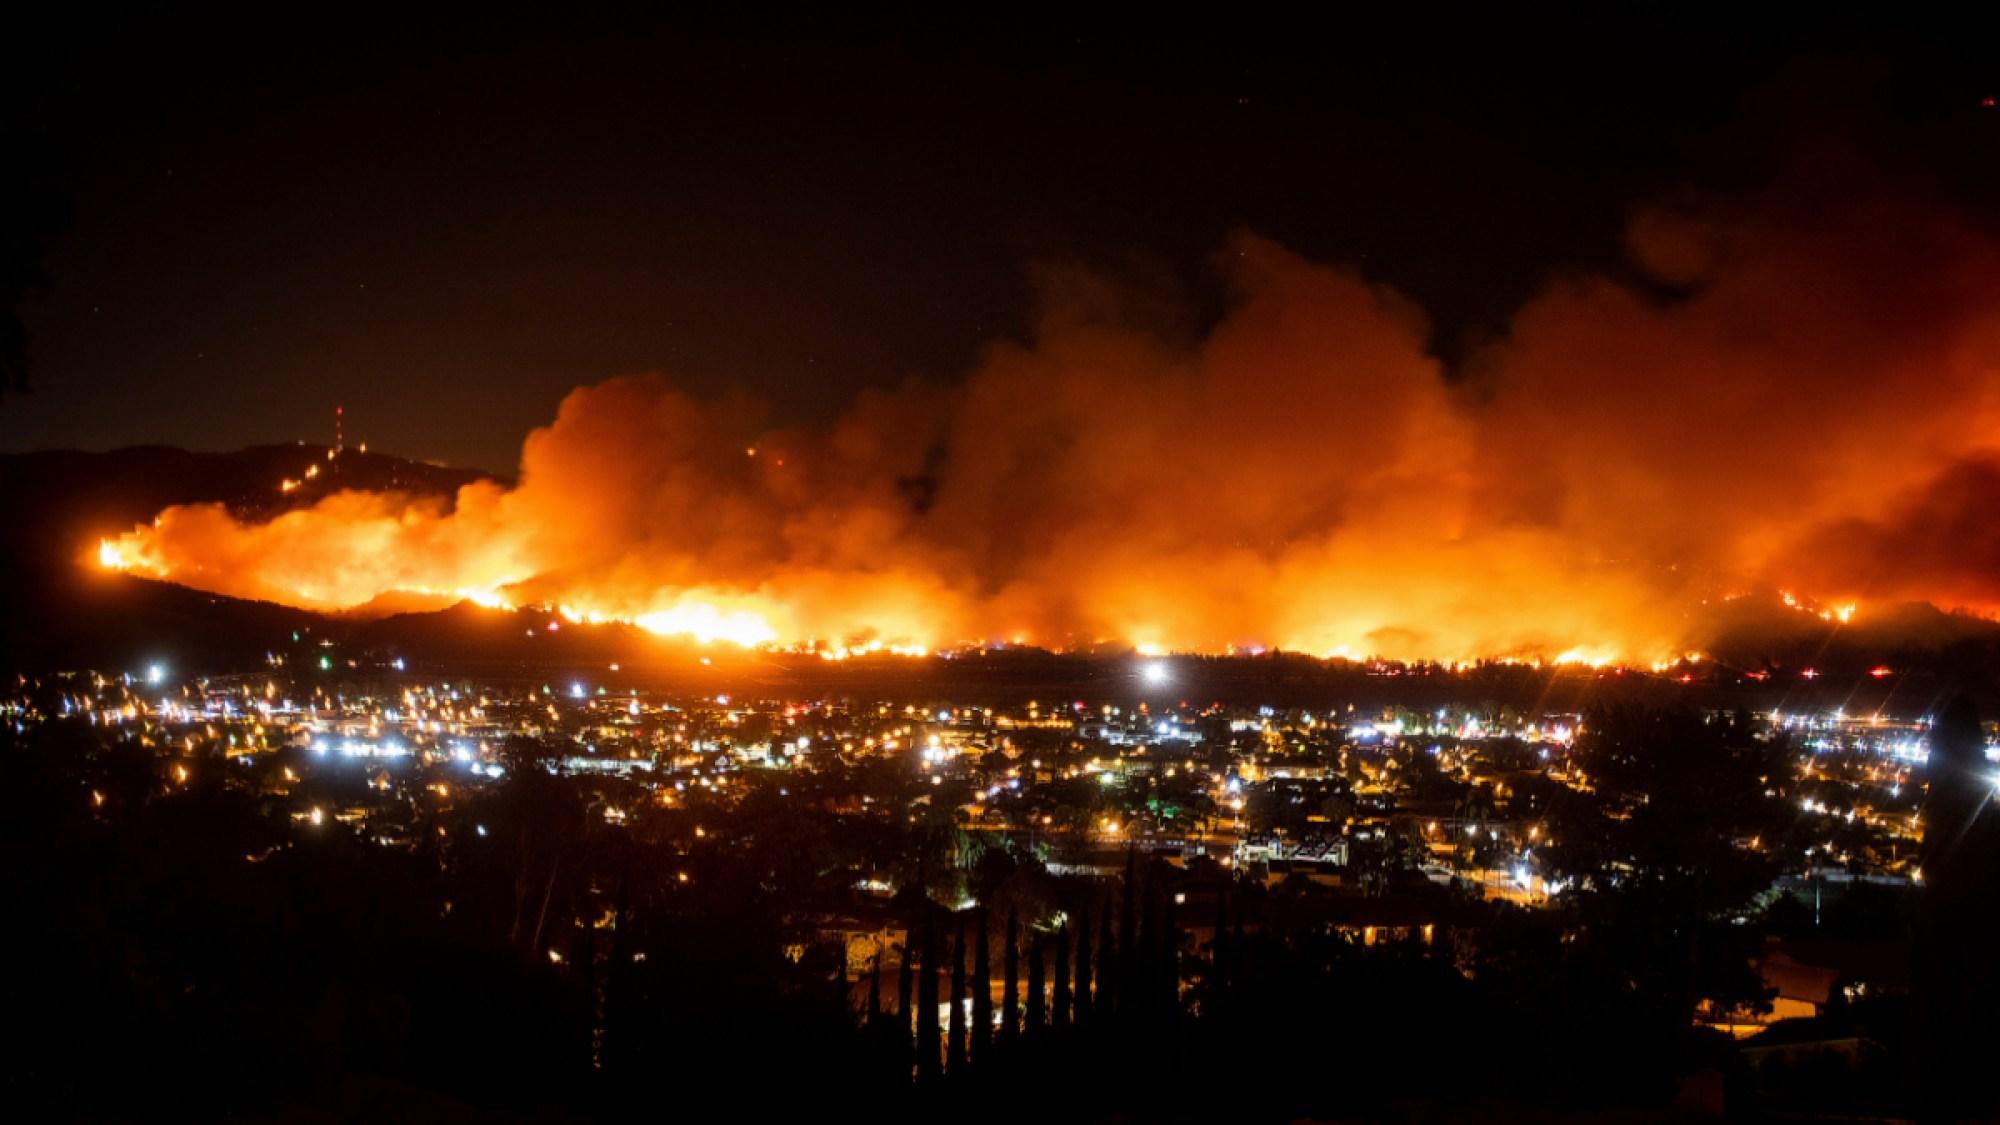 Incendio en Santa Paula, California.